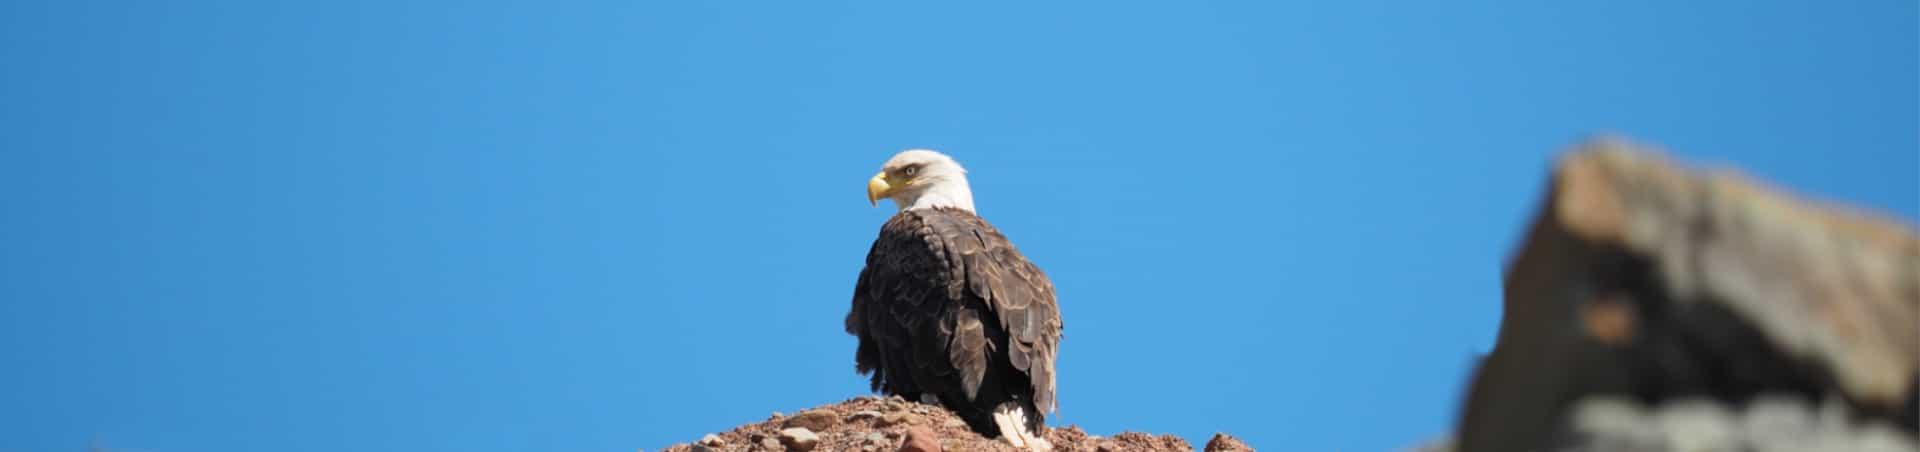 Kanada Bald Eagle